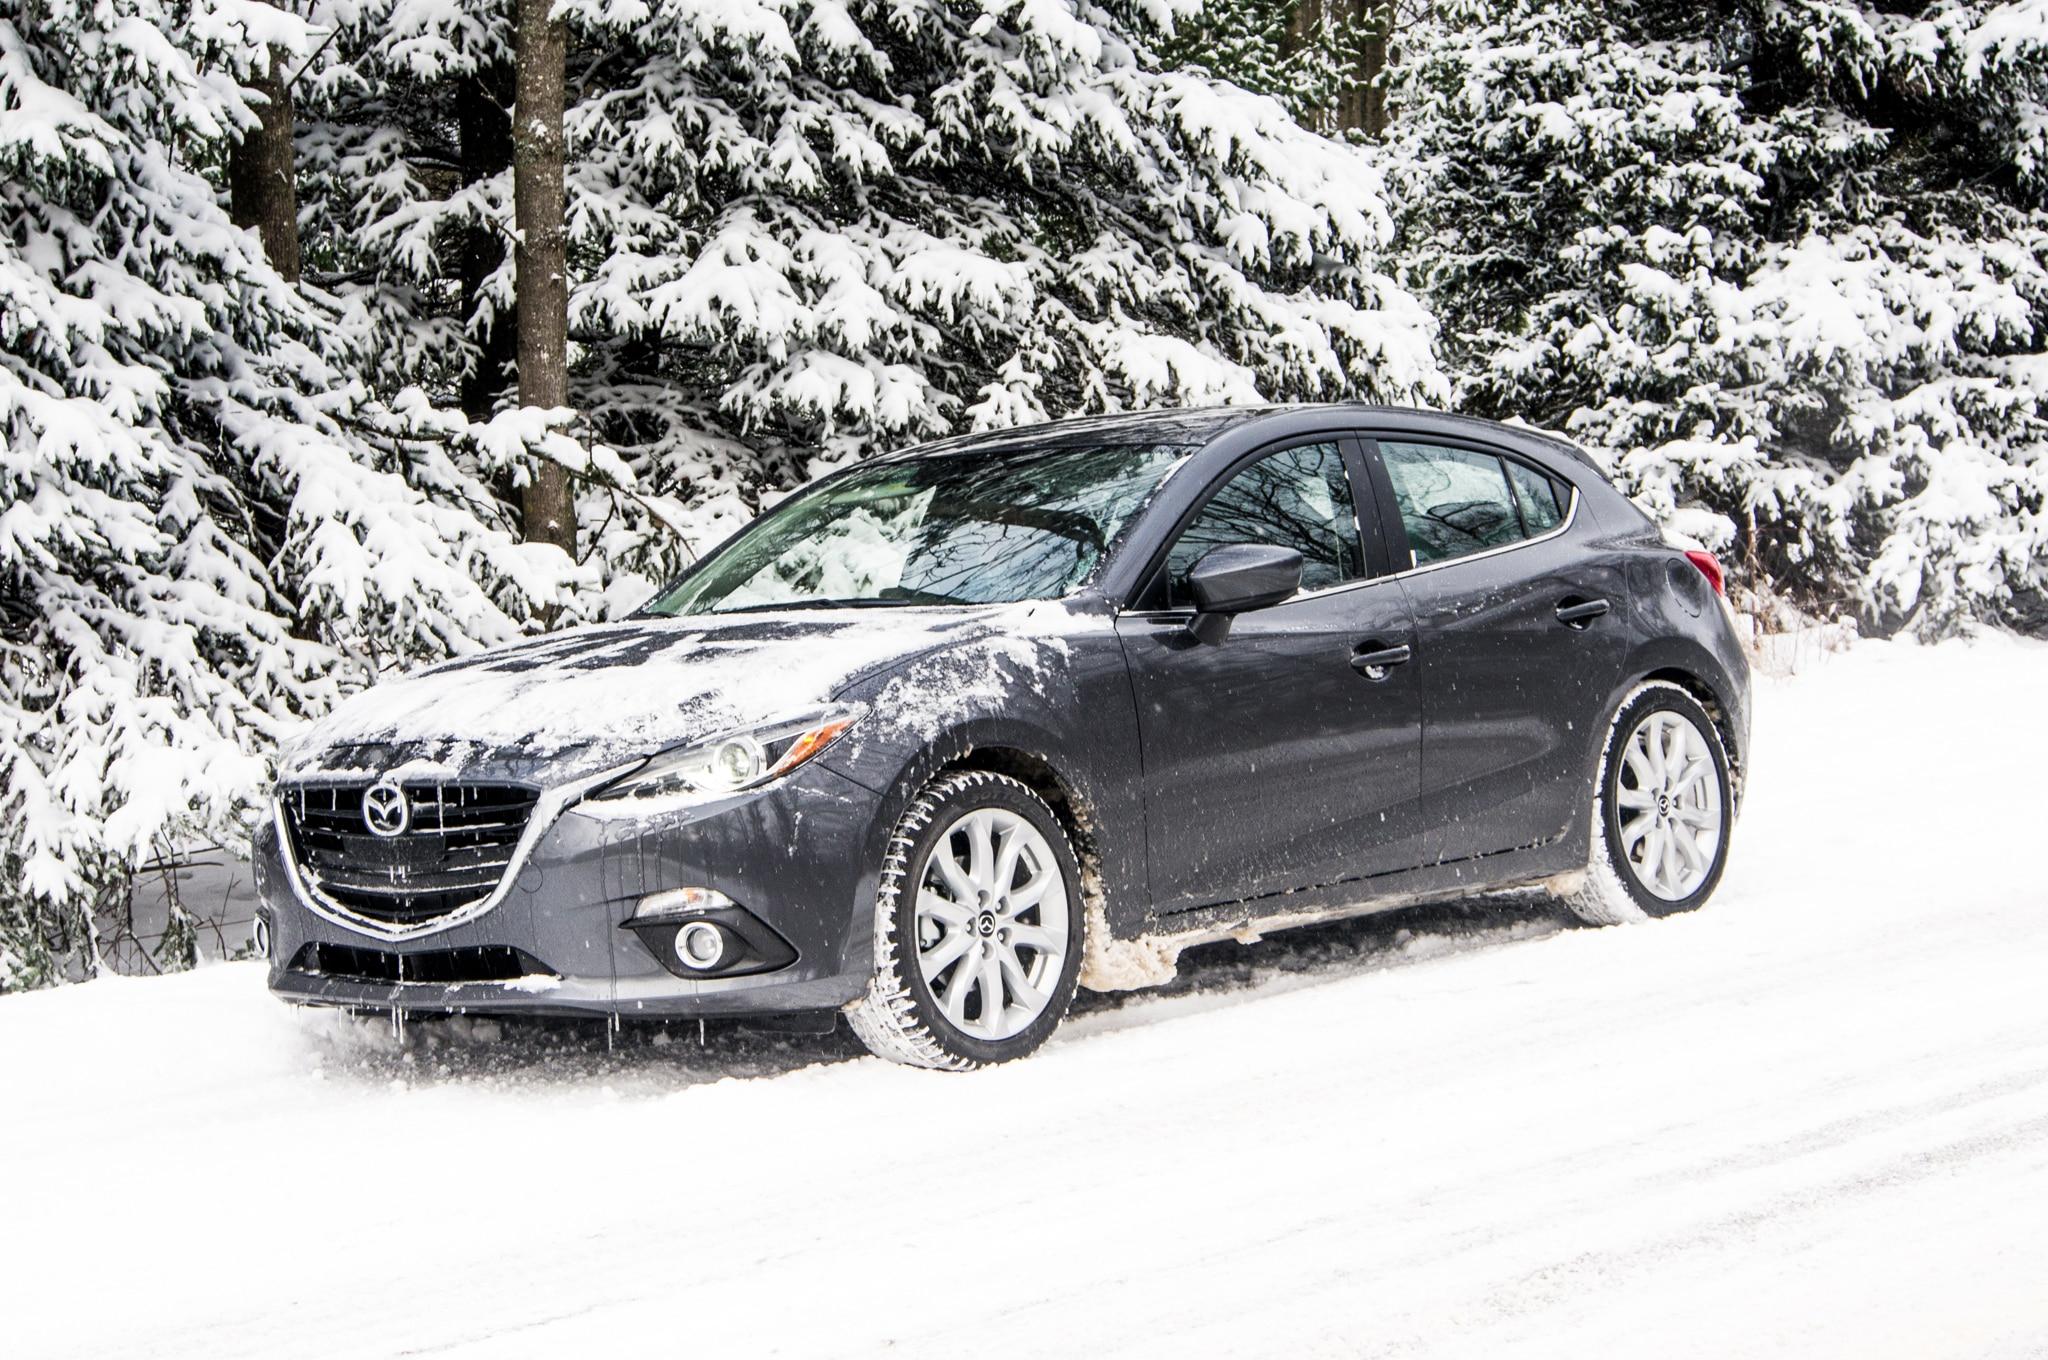 2014 Mazda 3 Front Three Quarter 2 Four Seasons March1